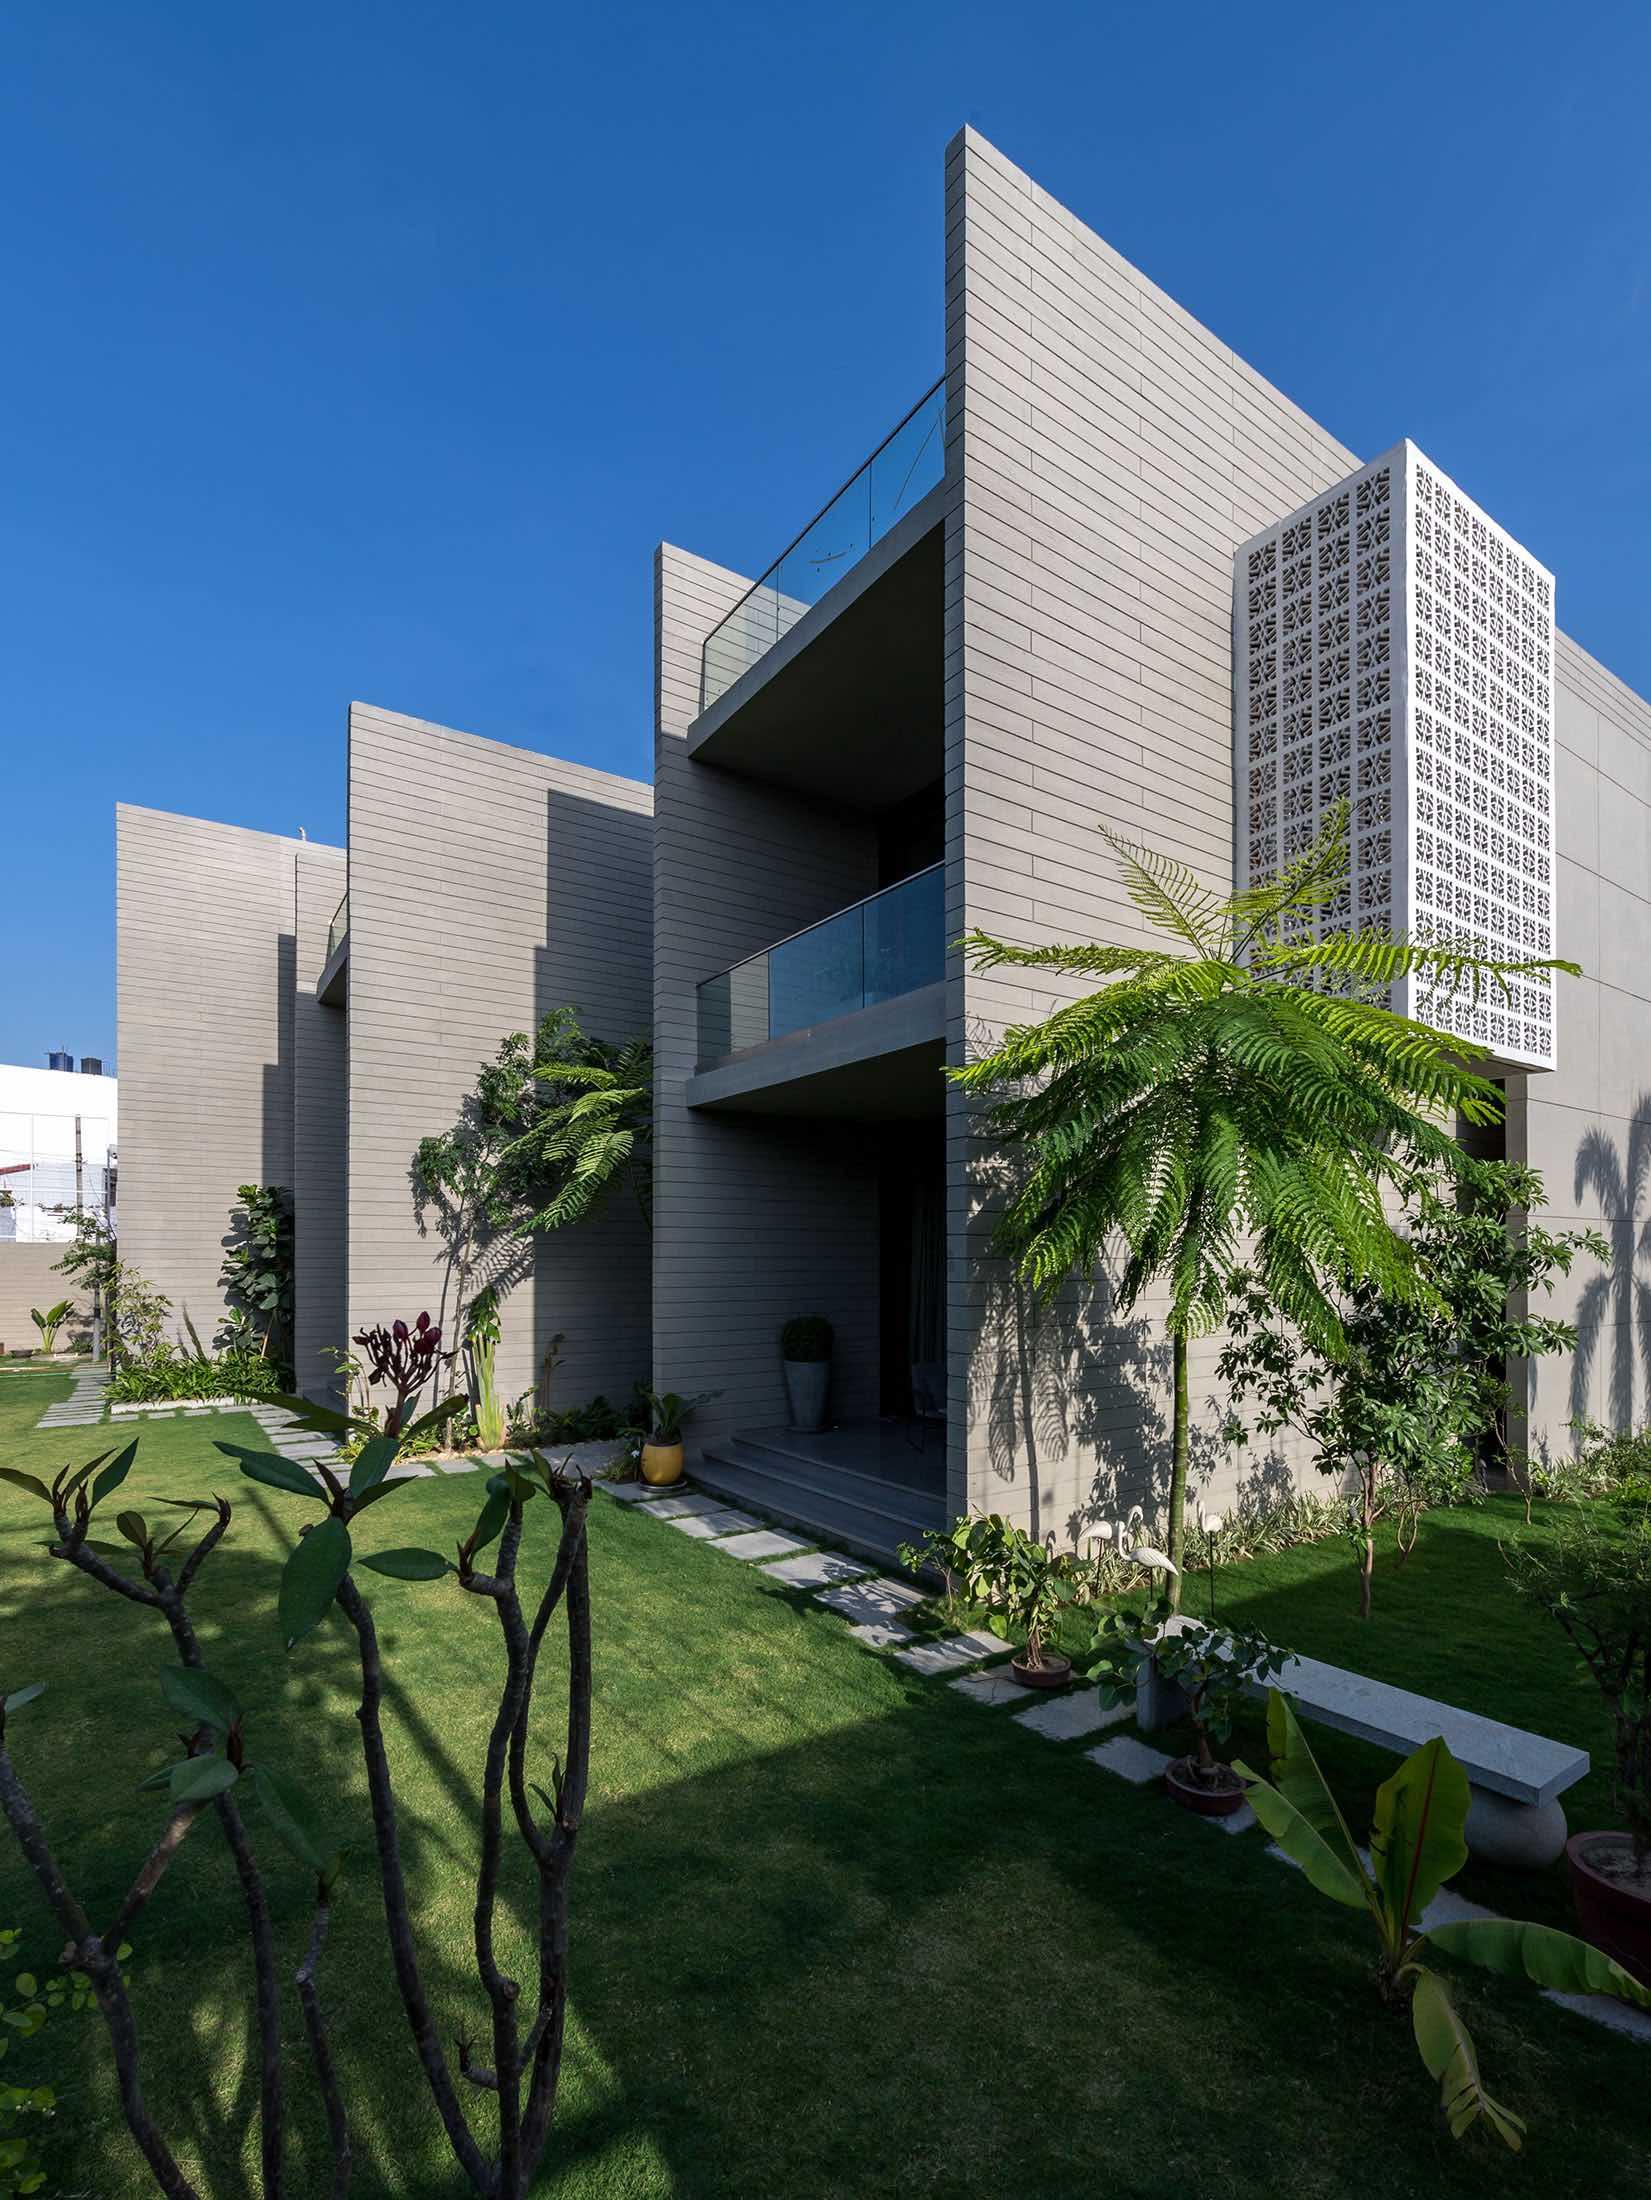 18_Screens_Sanjay_Puri_architects_india_amazingarchitecture_005.jpg